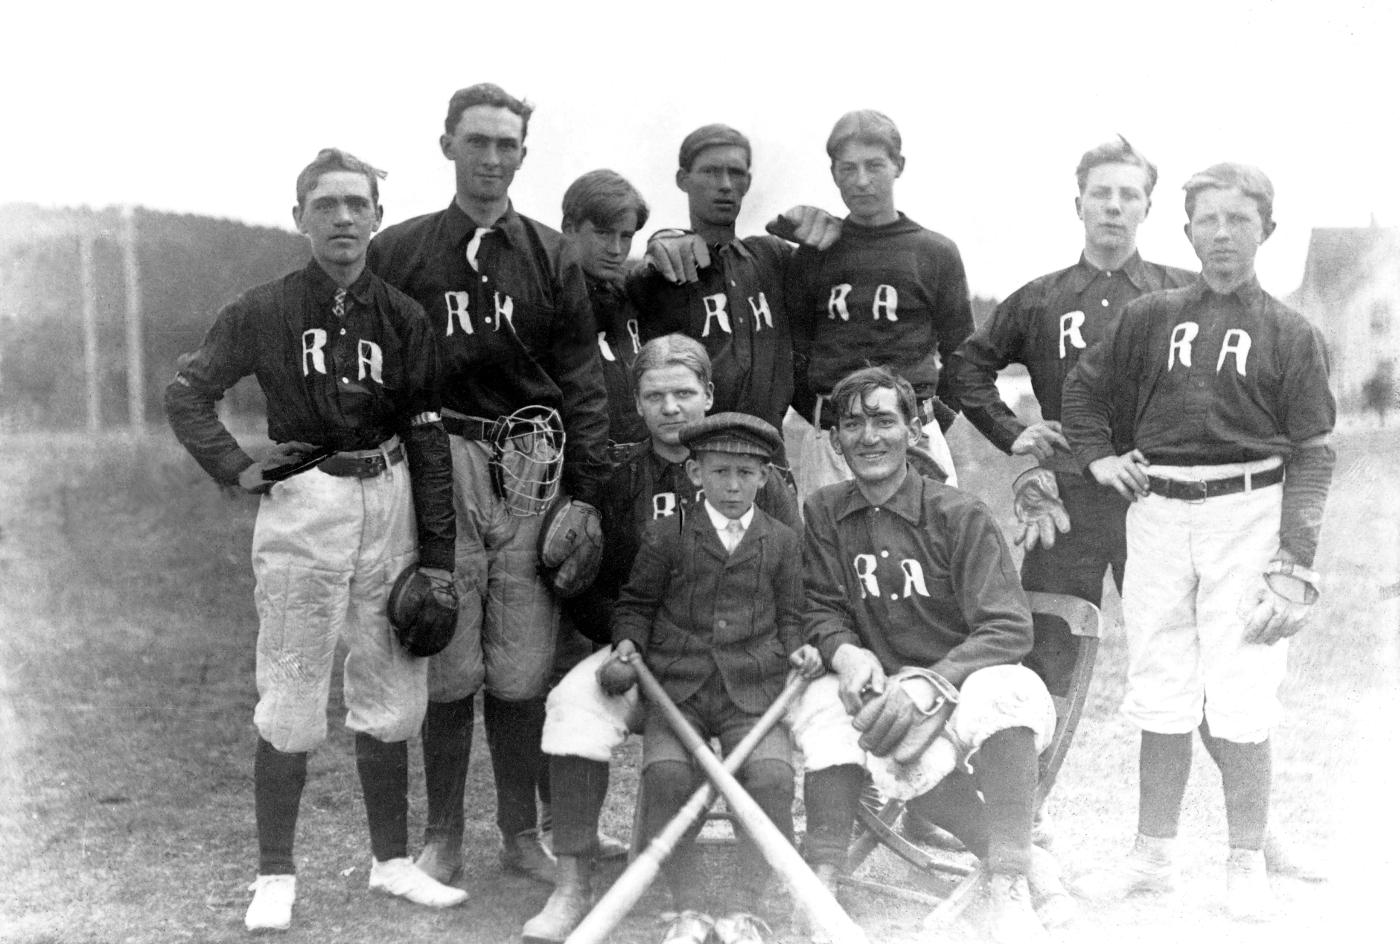 Everybody's like jet planes, islands, tigers on a gold leash on the Halifax Royal Academy Baseball Crew circa 1930